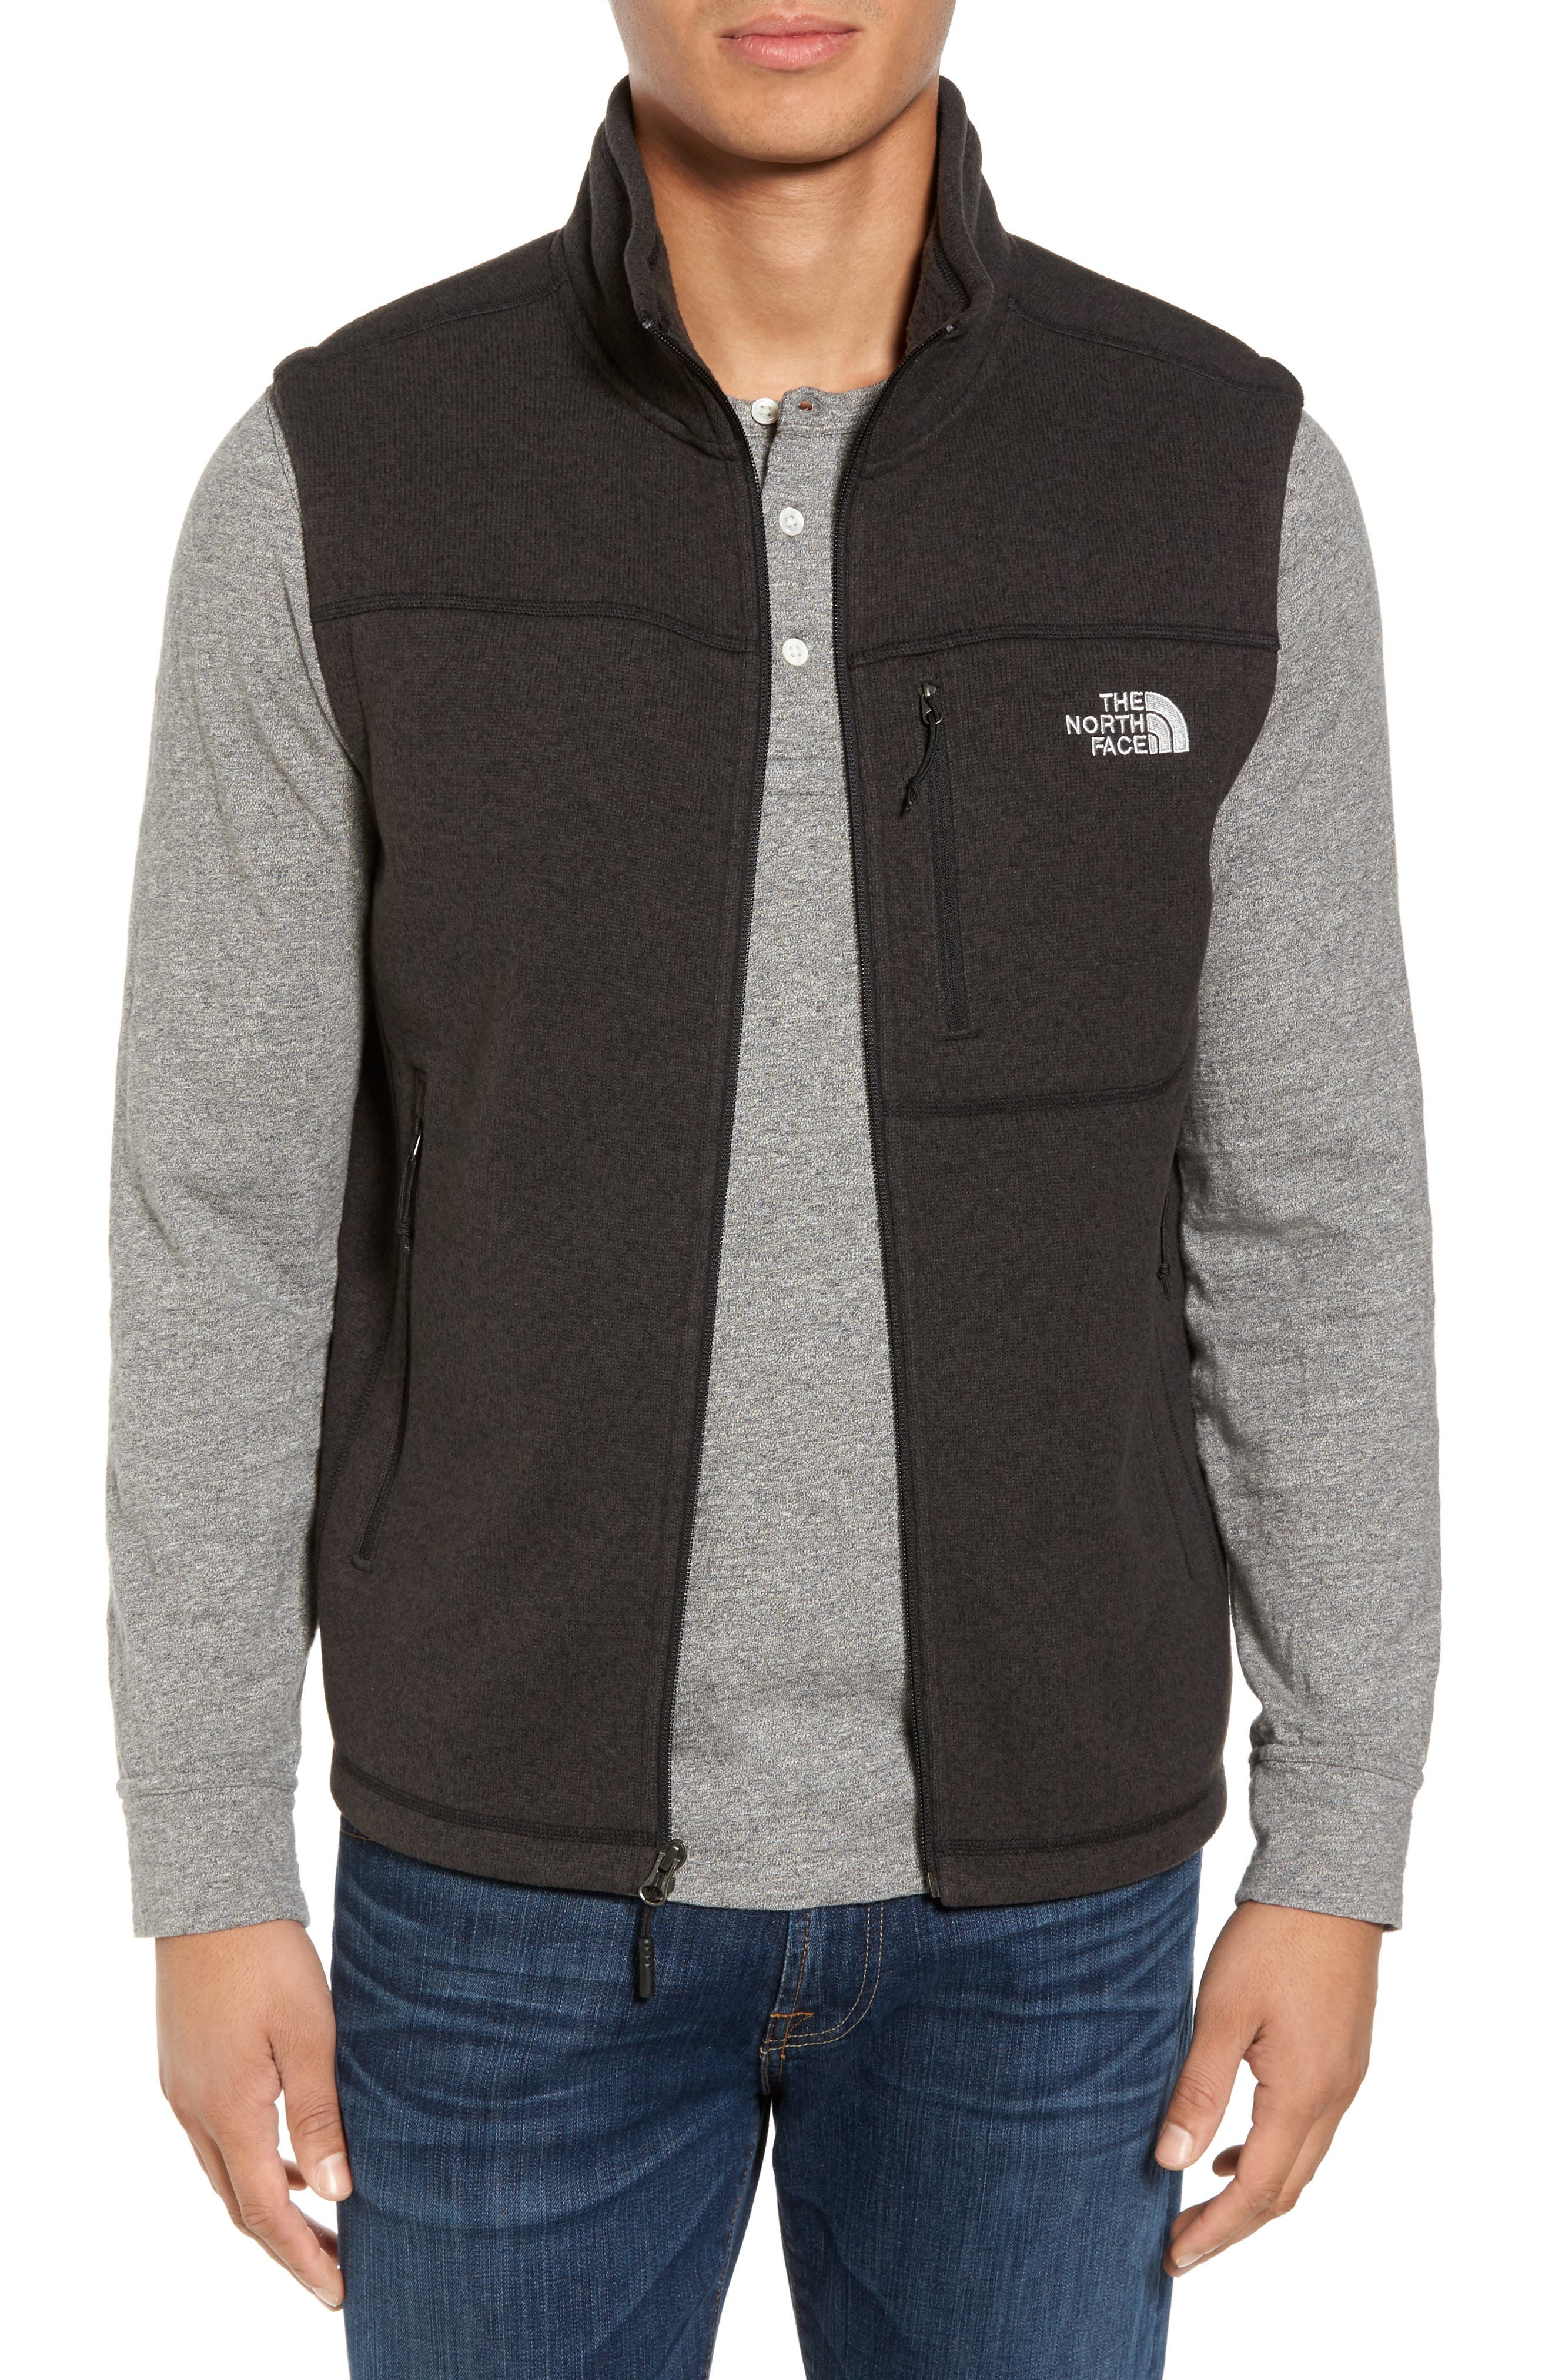 Gordon Lyons Zip Fleece Vest,                             Main thumbnail 1, color,